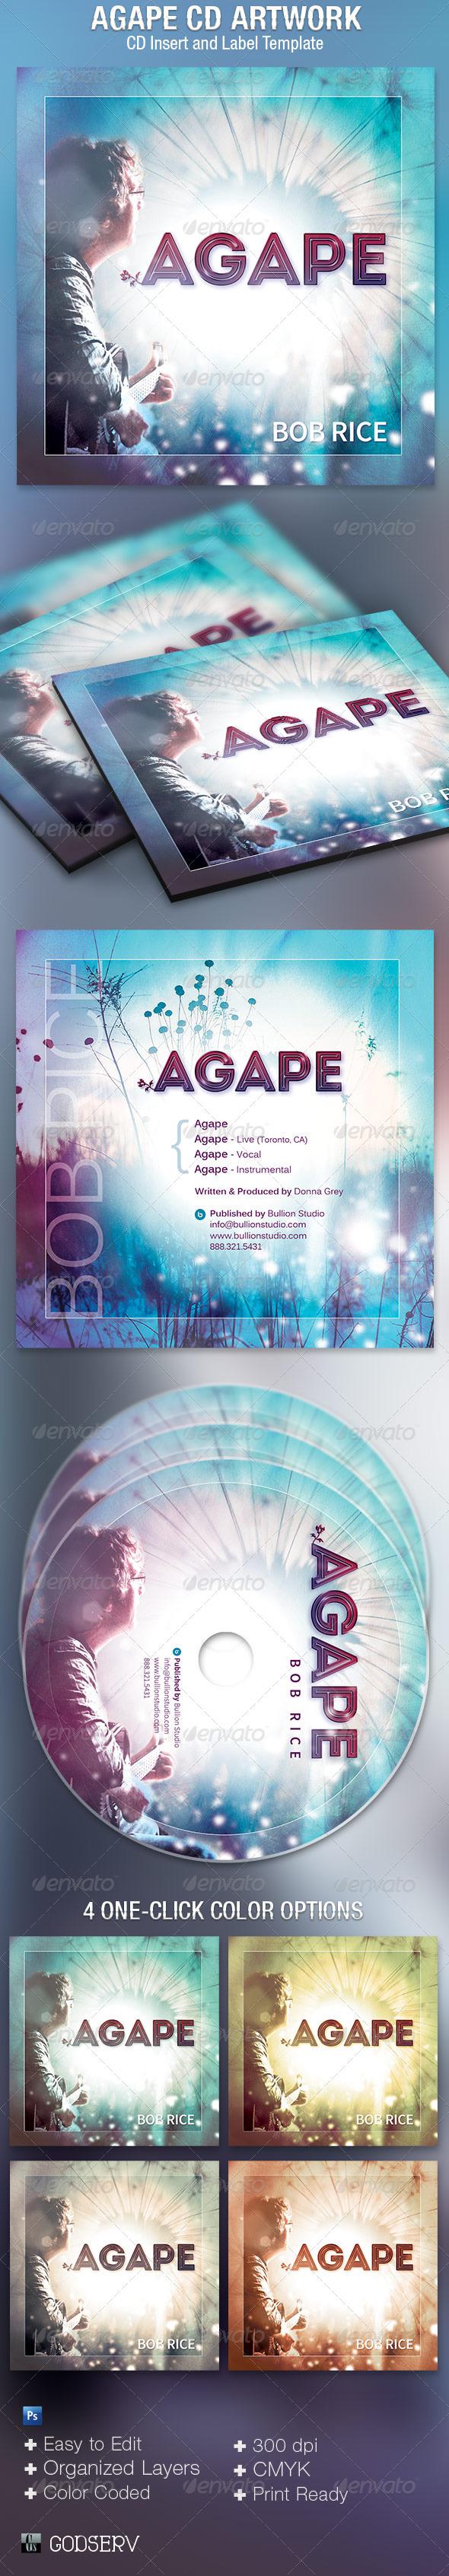 Agape CD Artwork Template - CD & DVD Artwork Print Templates